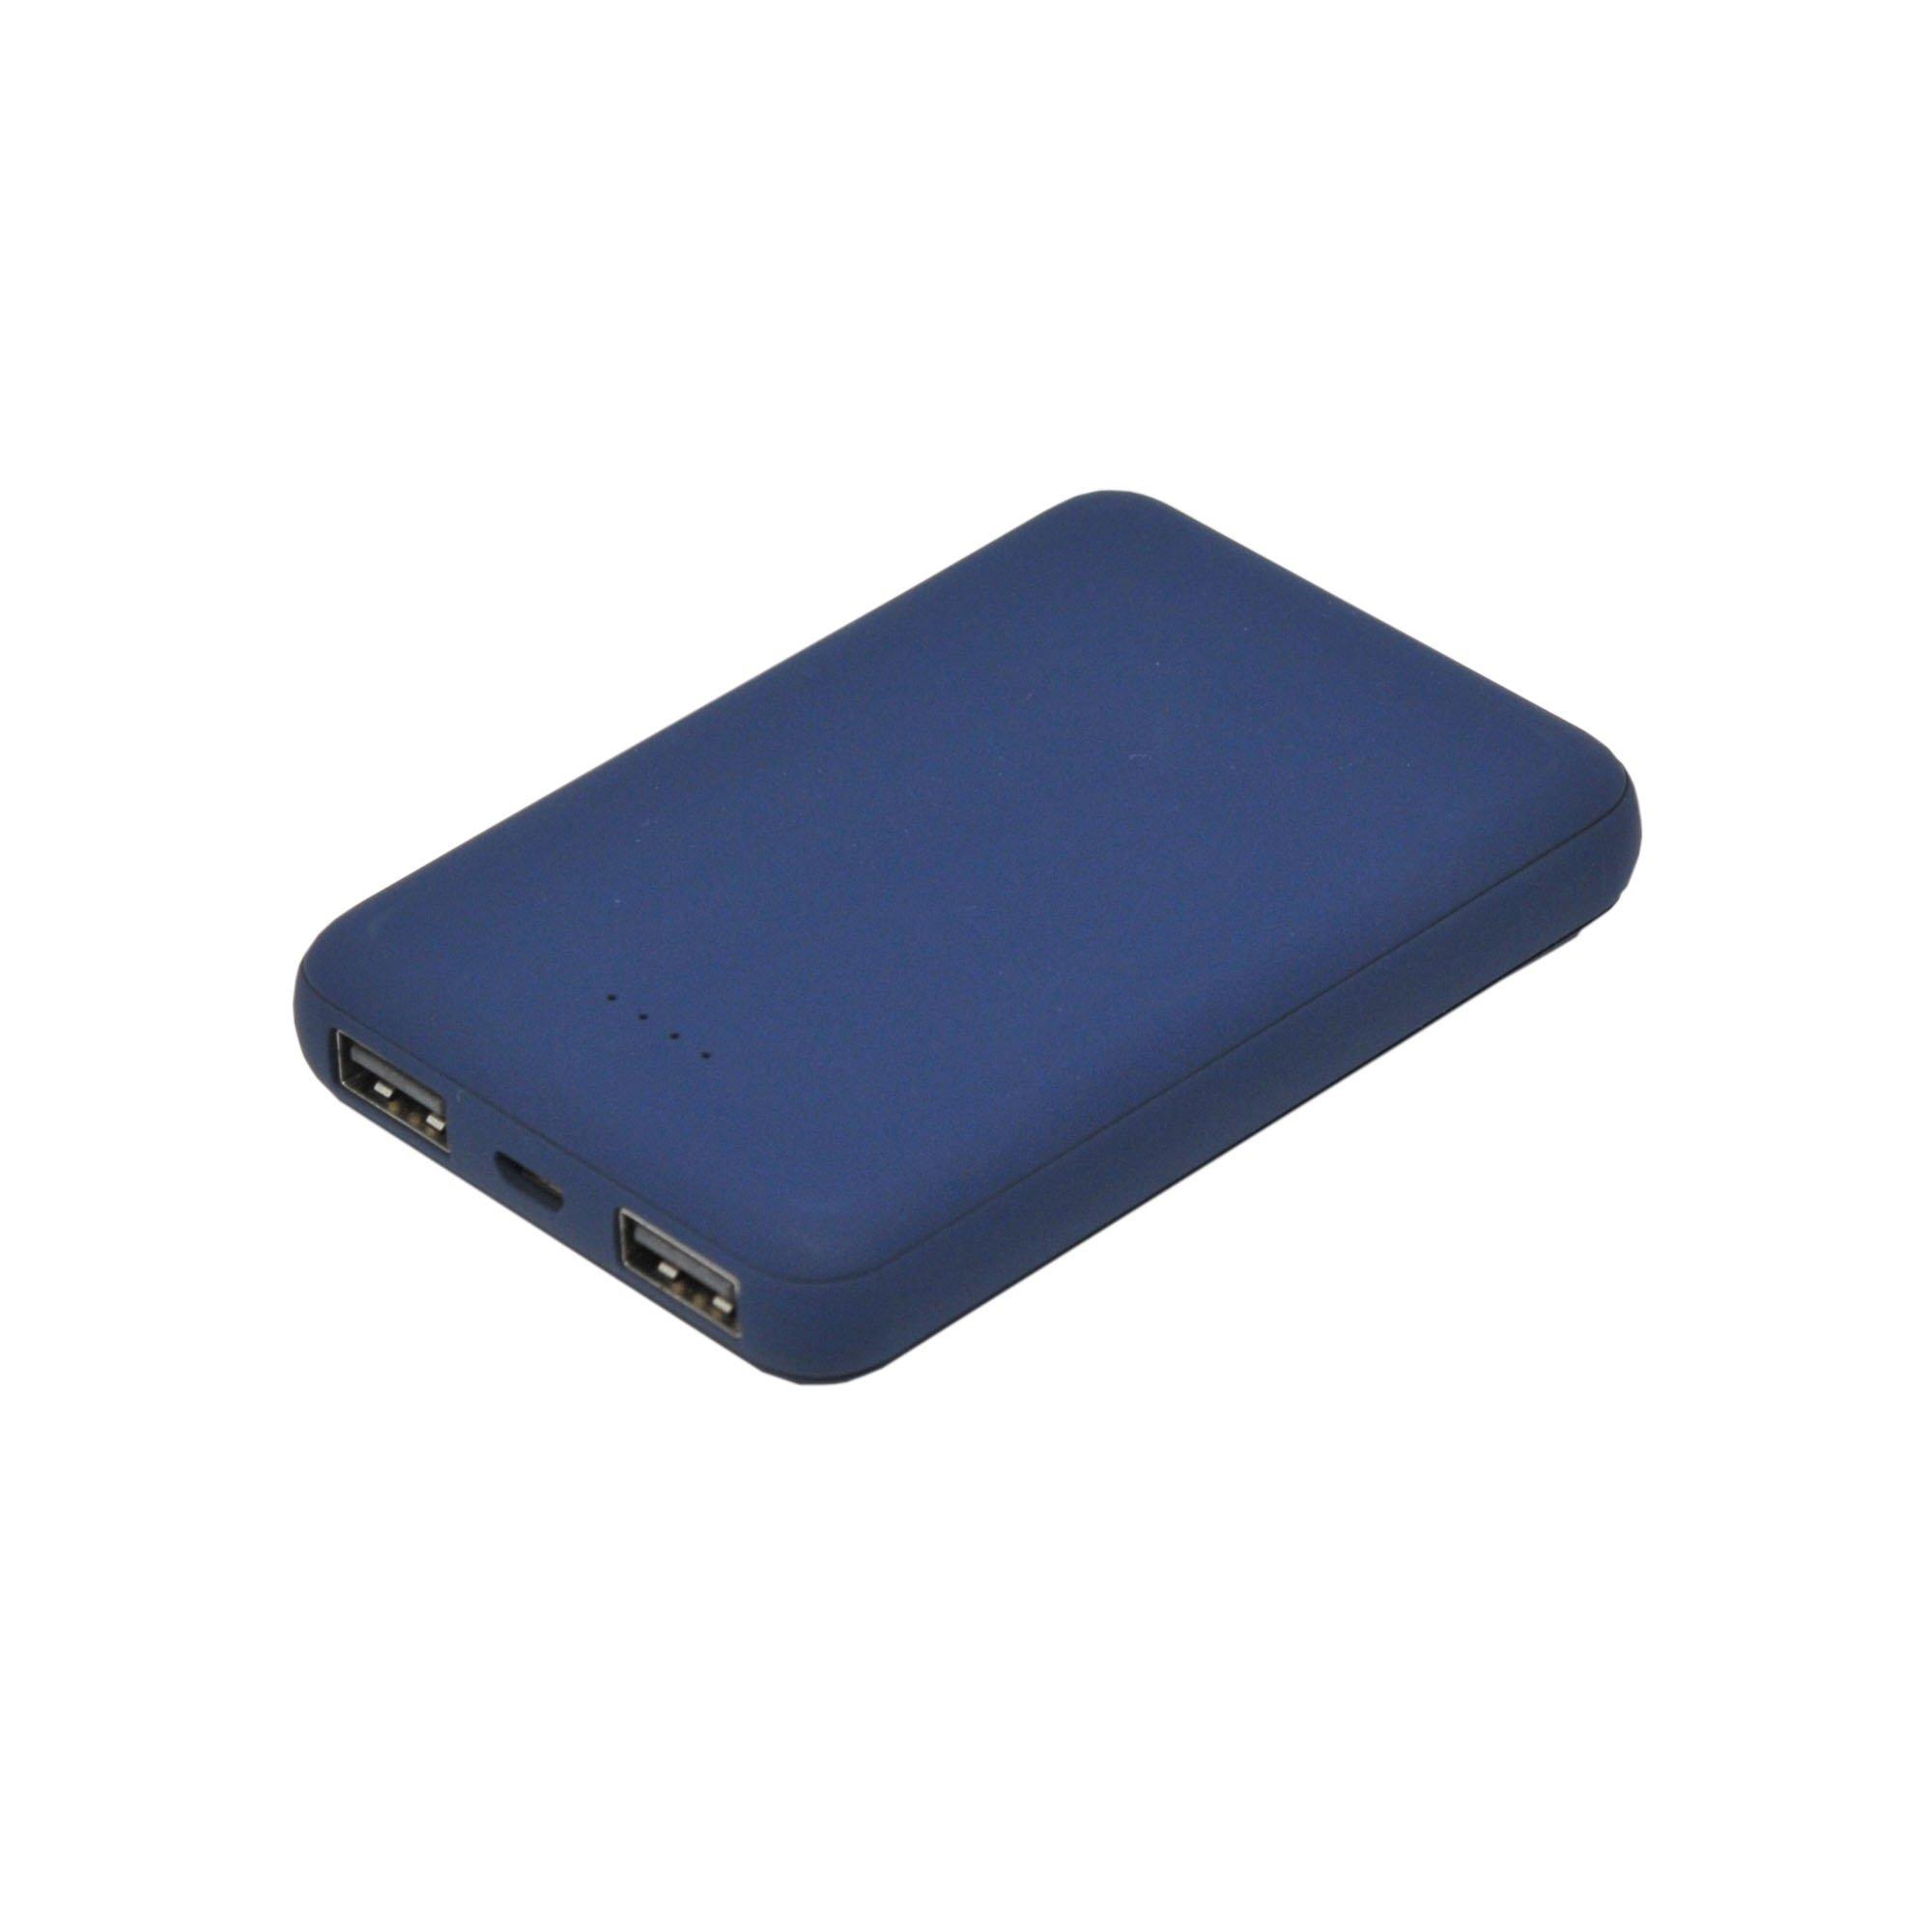 Внешний аккумулятор, Vogue PB, 5000 mAh, синий